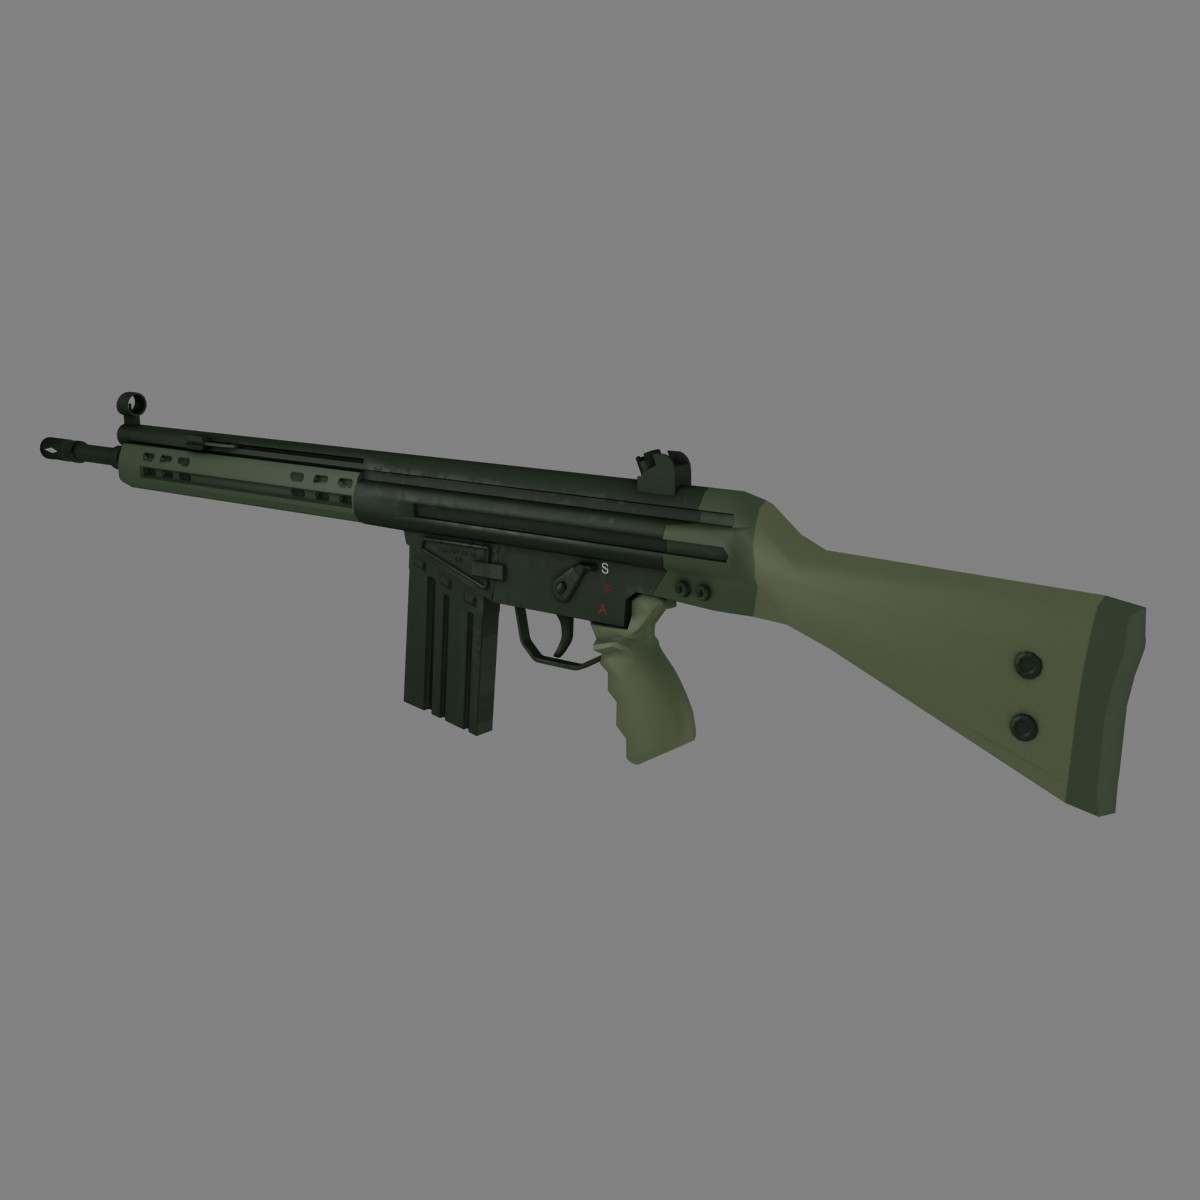 3d g3 rifle model